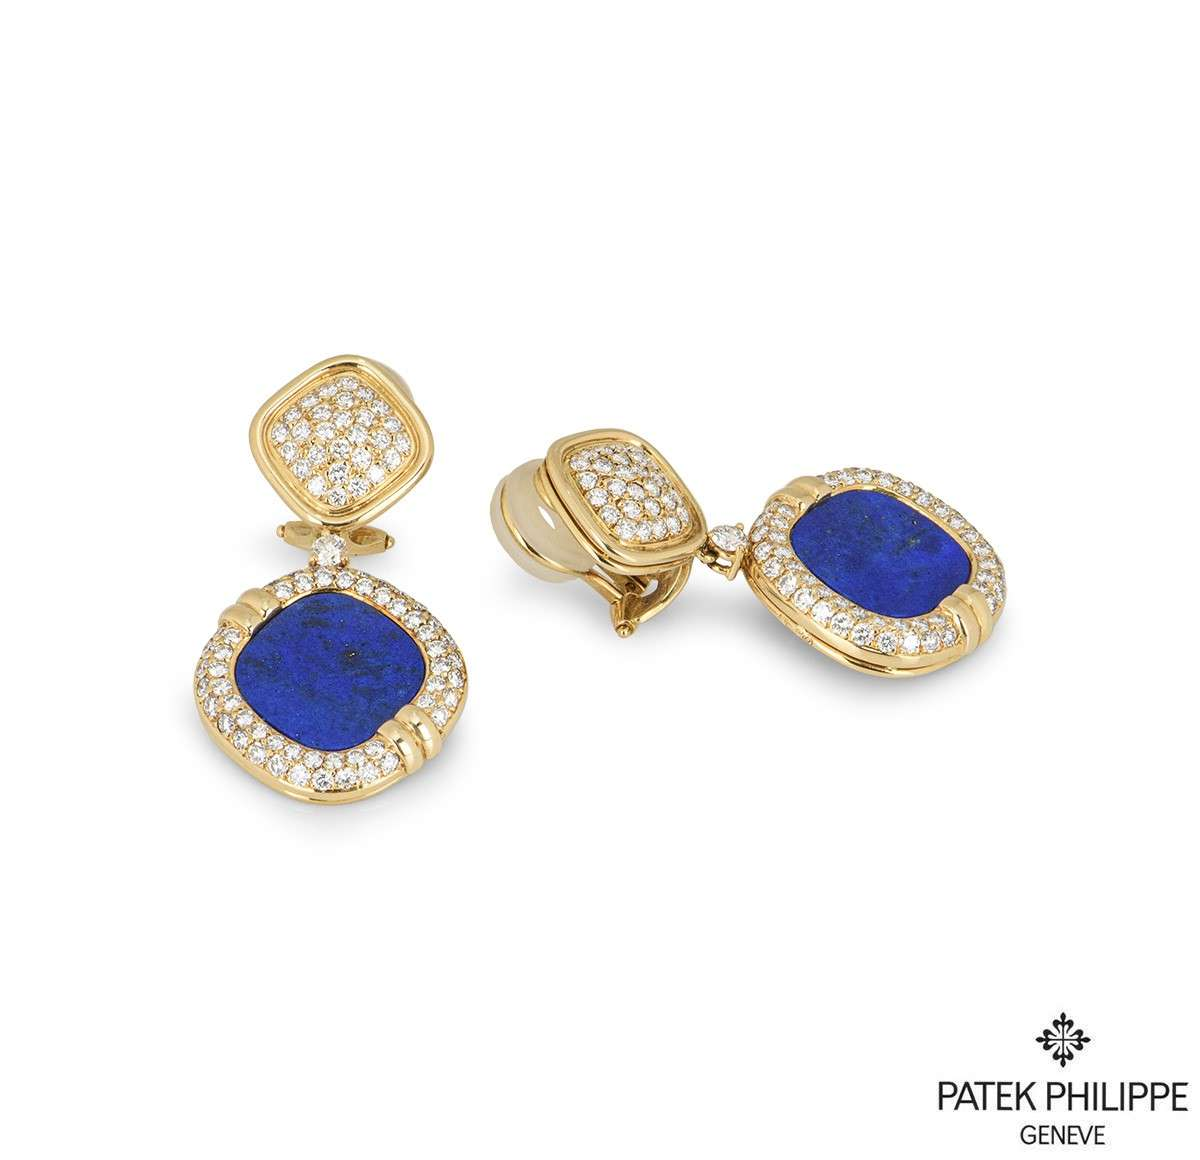 Patek Philippe Rare Lapis Lazuil & Diamond Drop Earrings